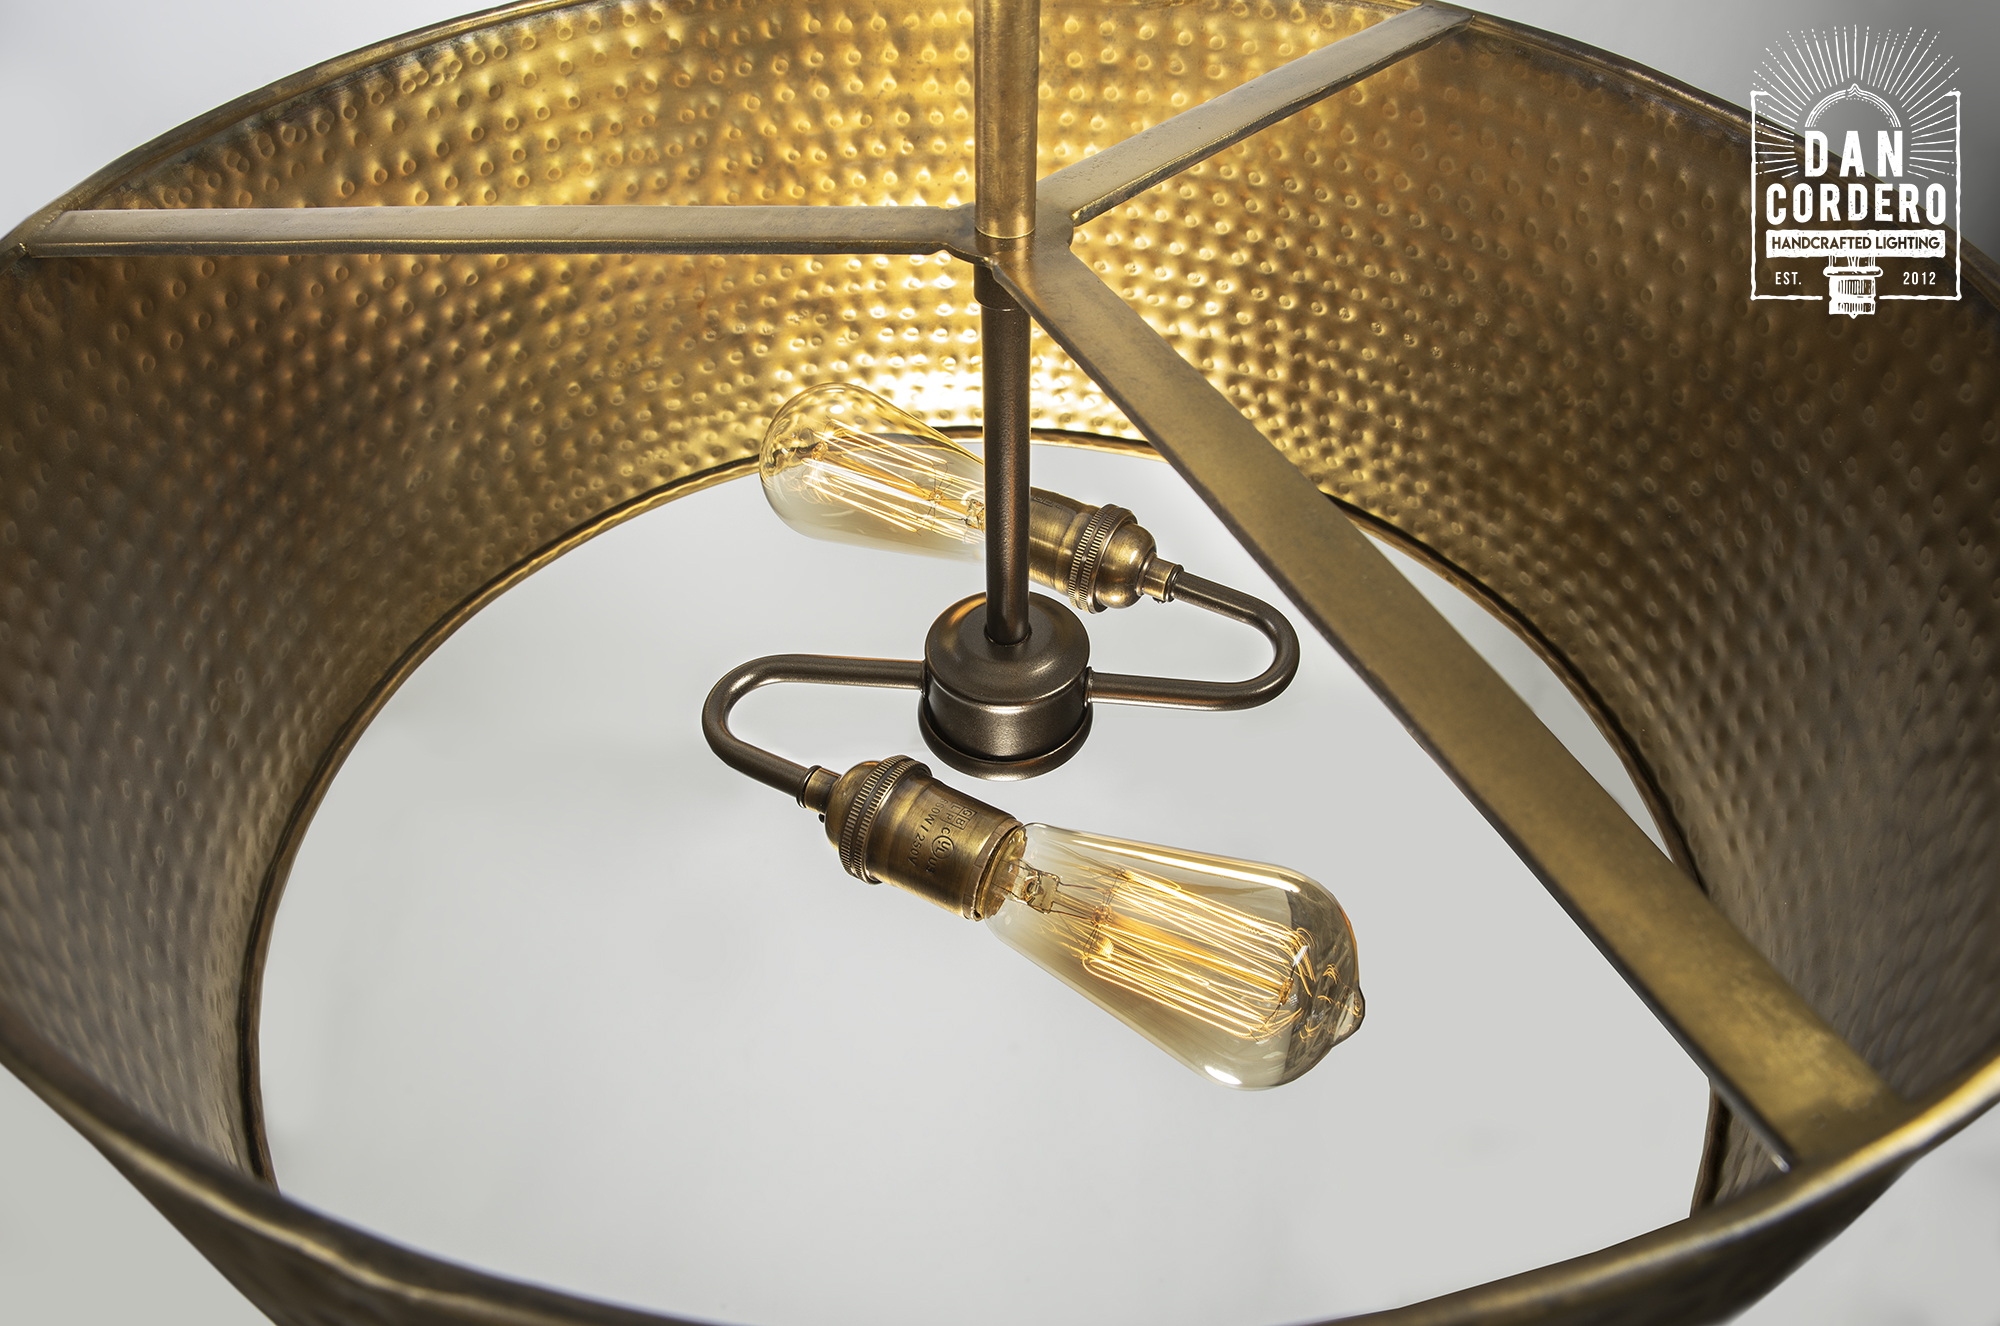 Delmont Hammered Drum Pendant Light Fixture